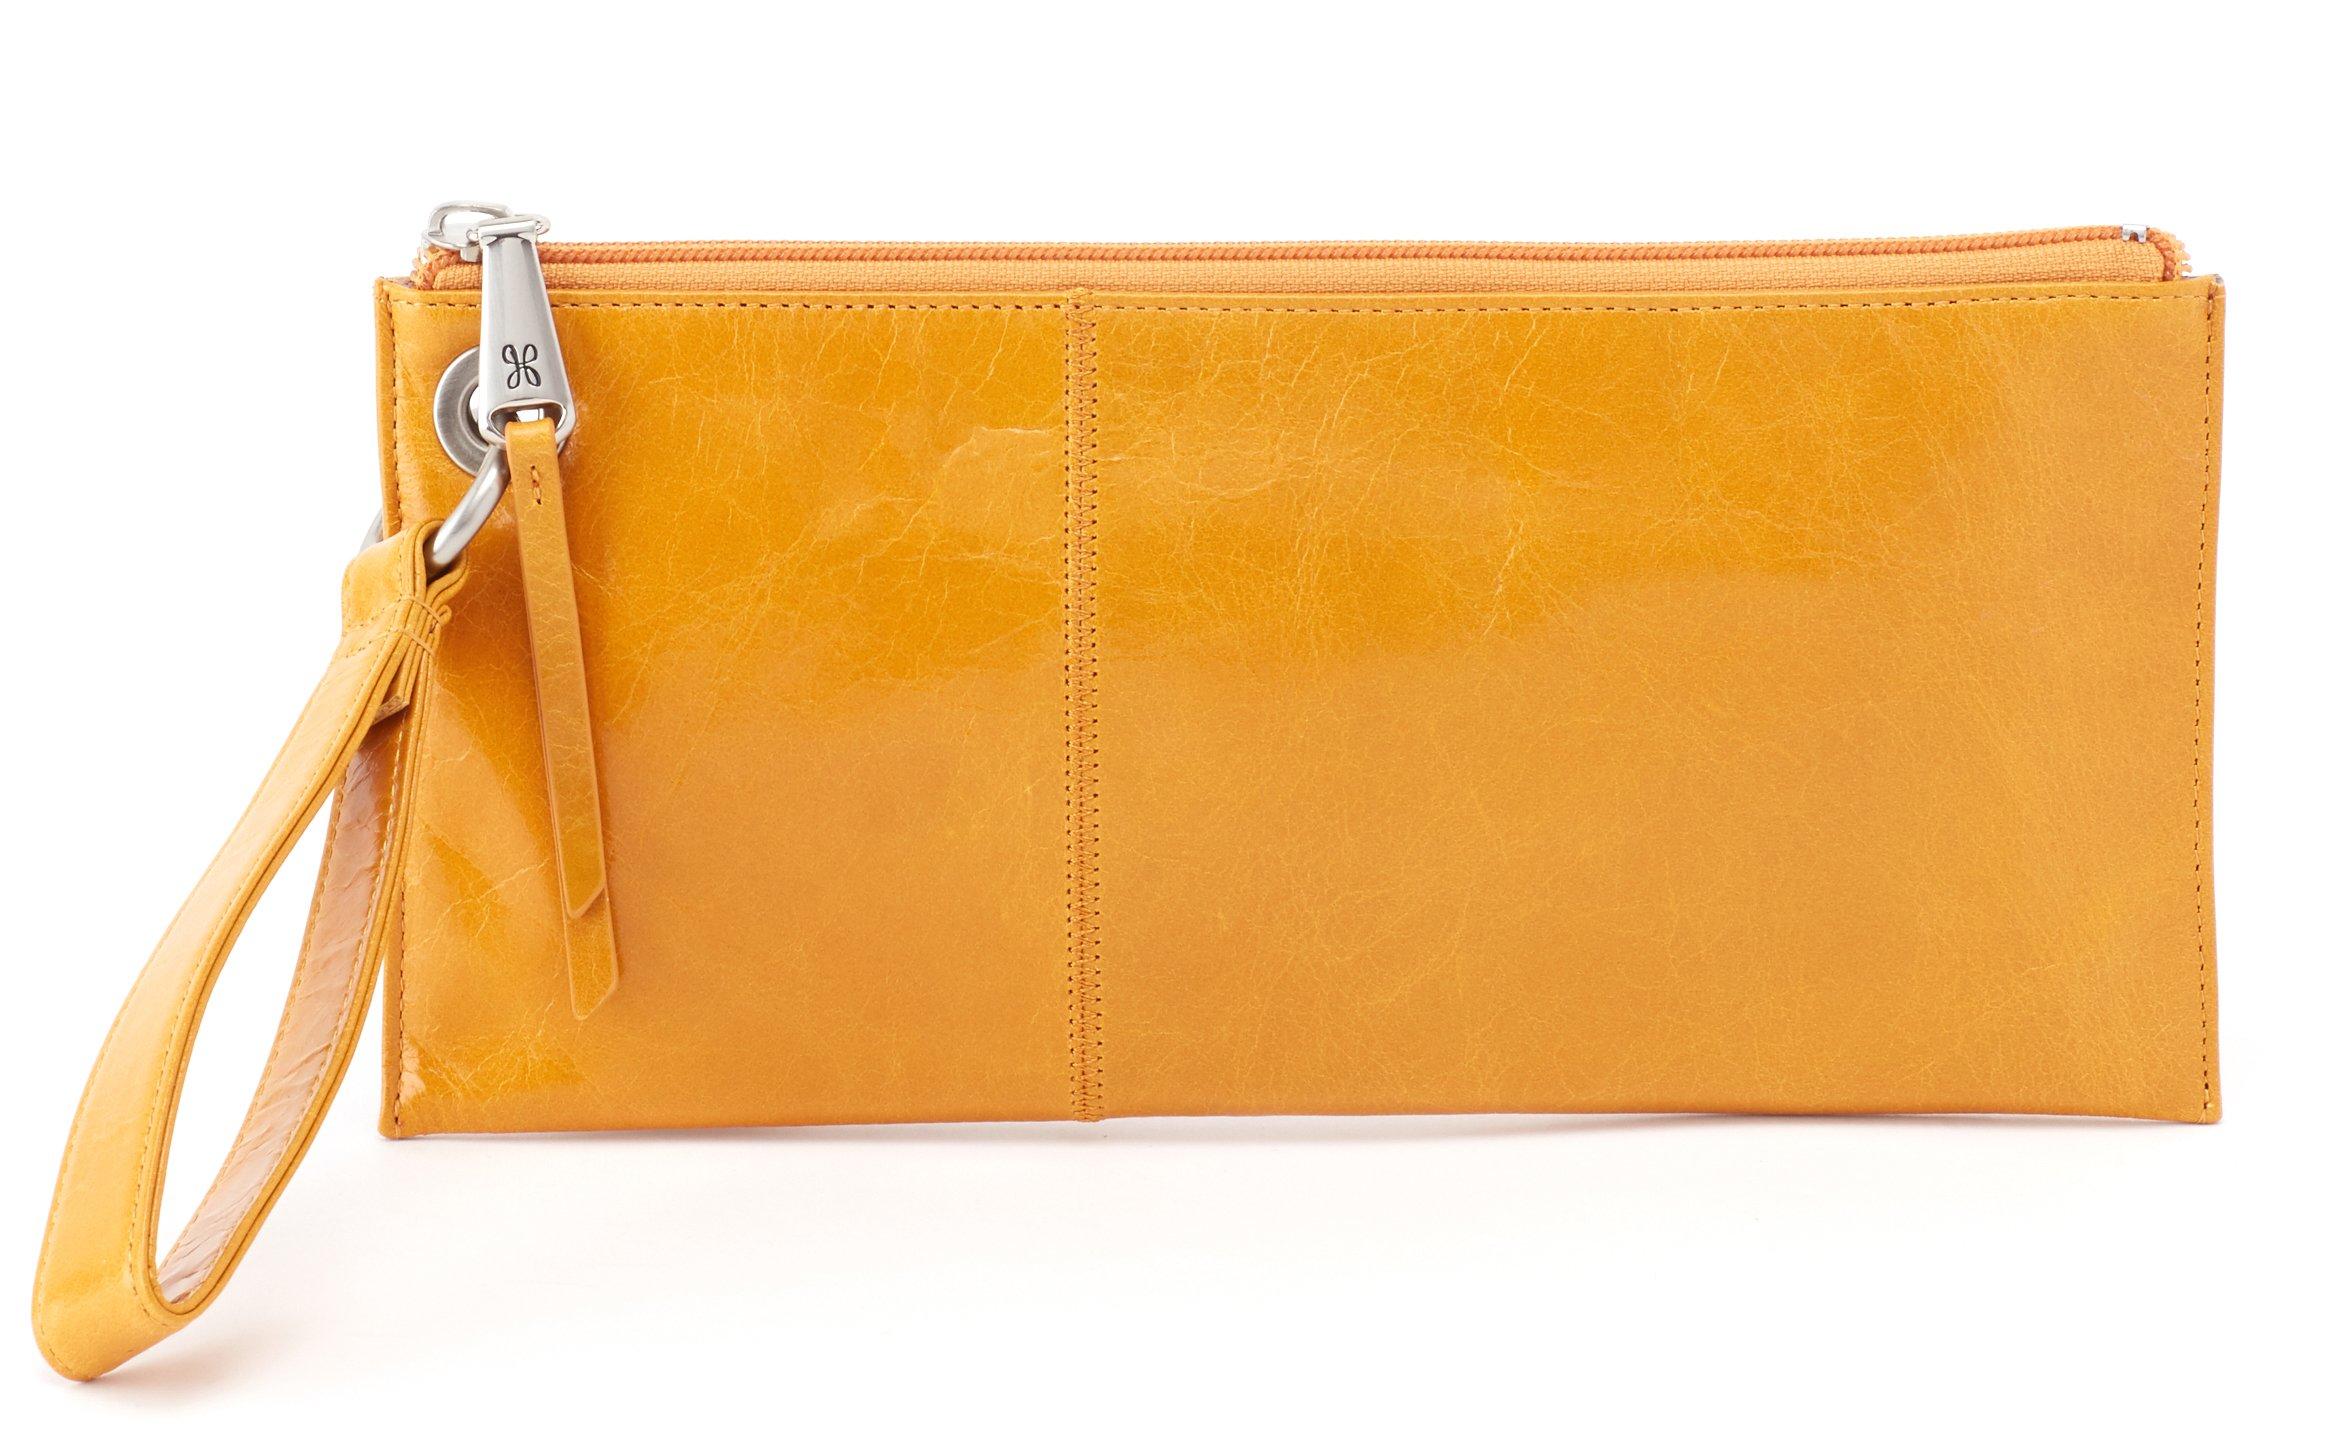 Hobo Womens Leather Vintage Vida Clutch Wallet (Amber)